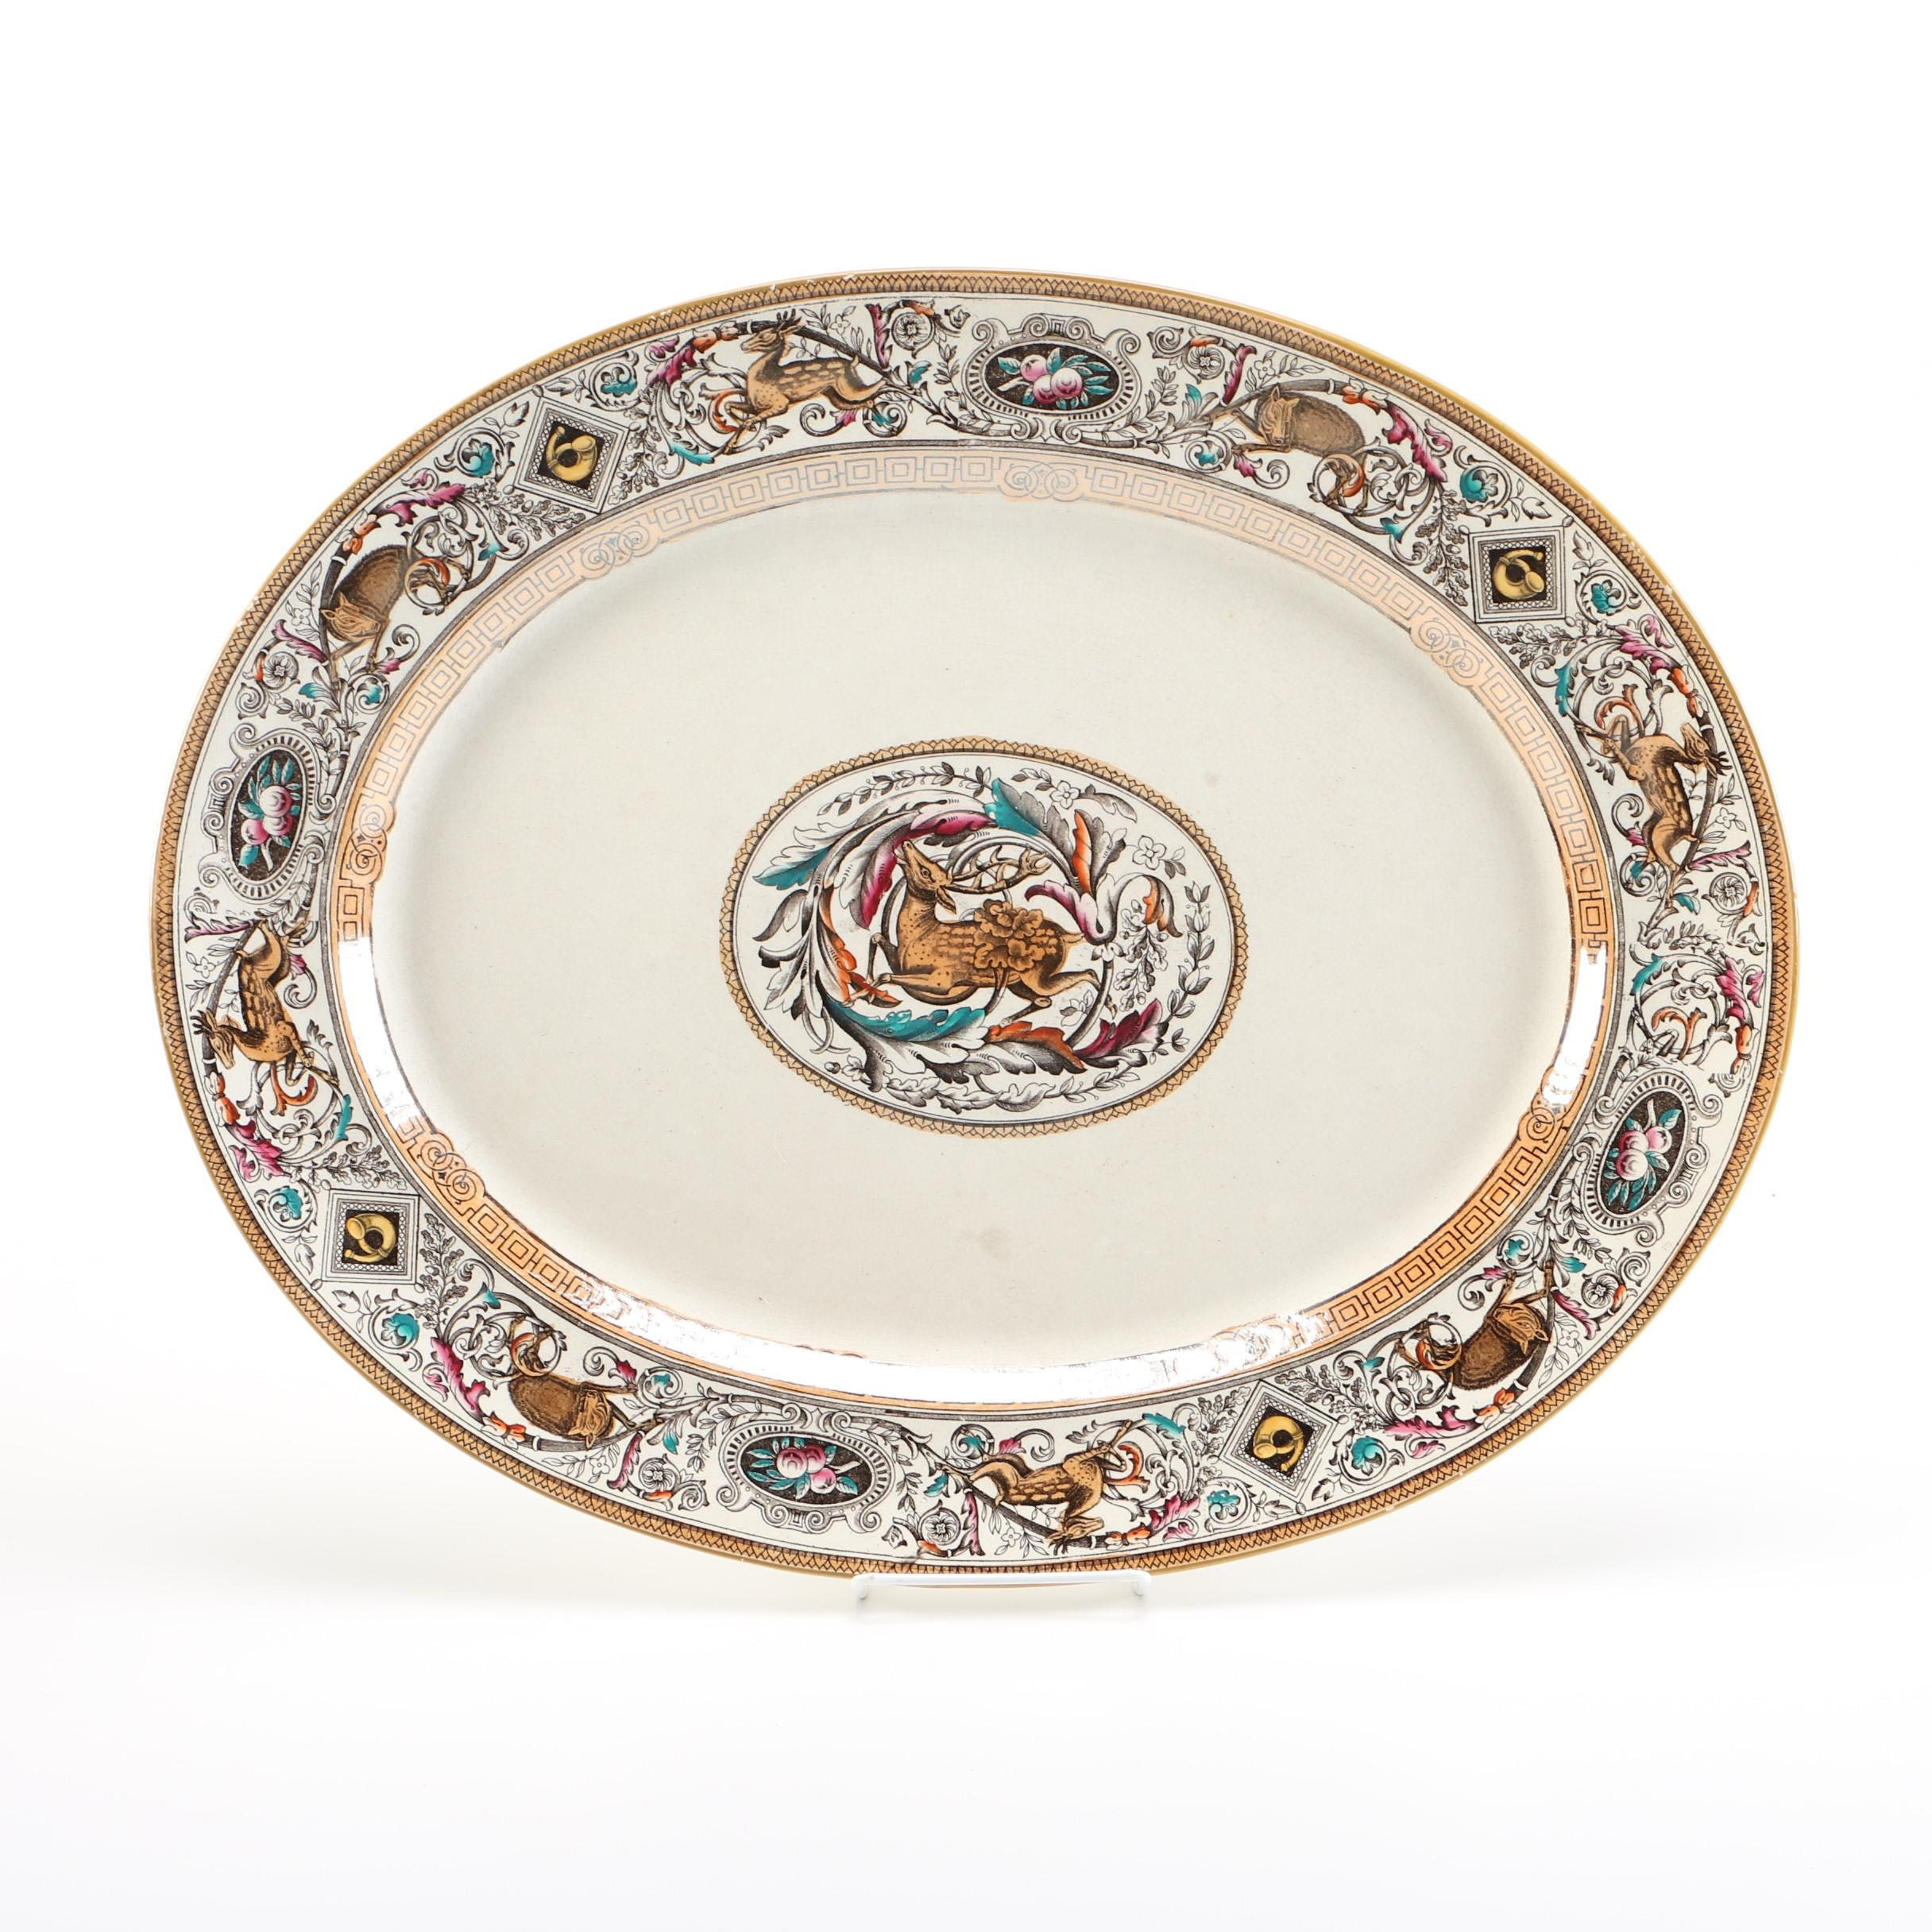 19th Century Borgia Ceramic Oval Serving Platter